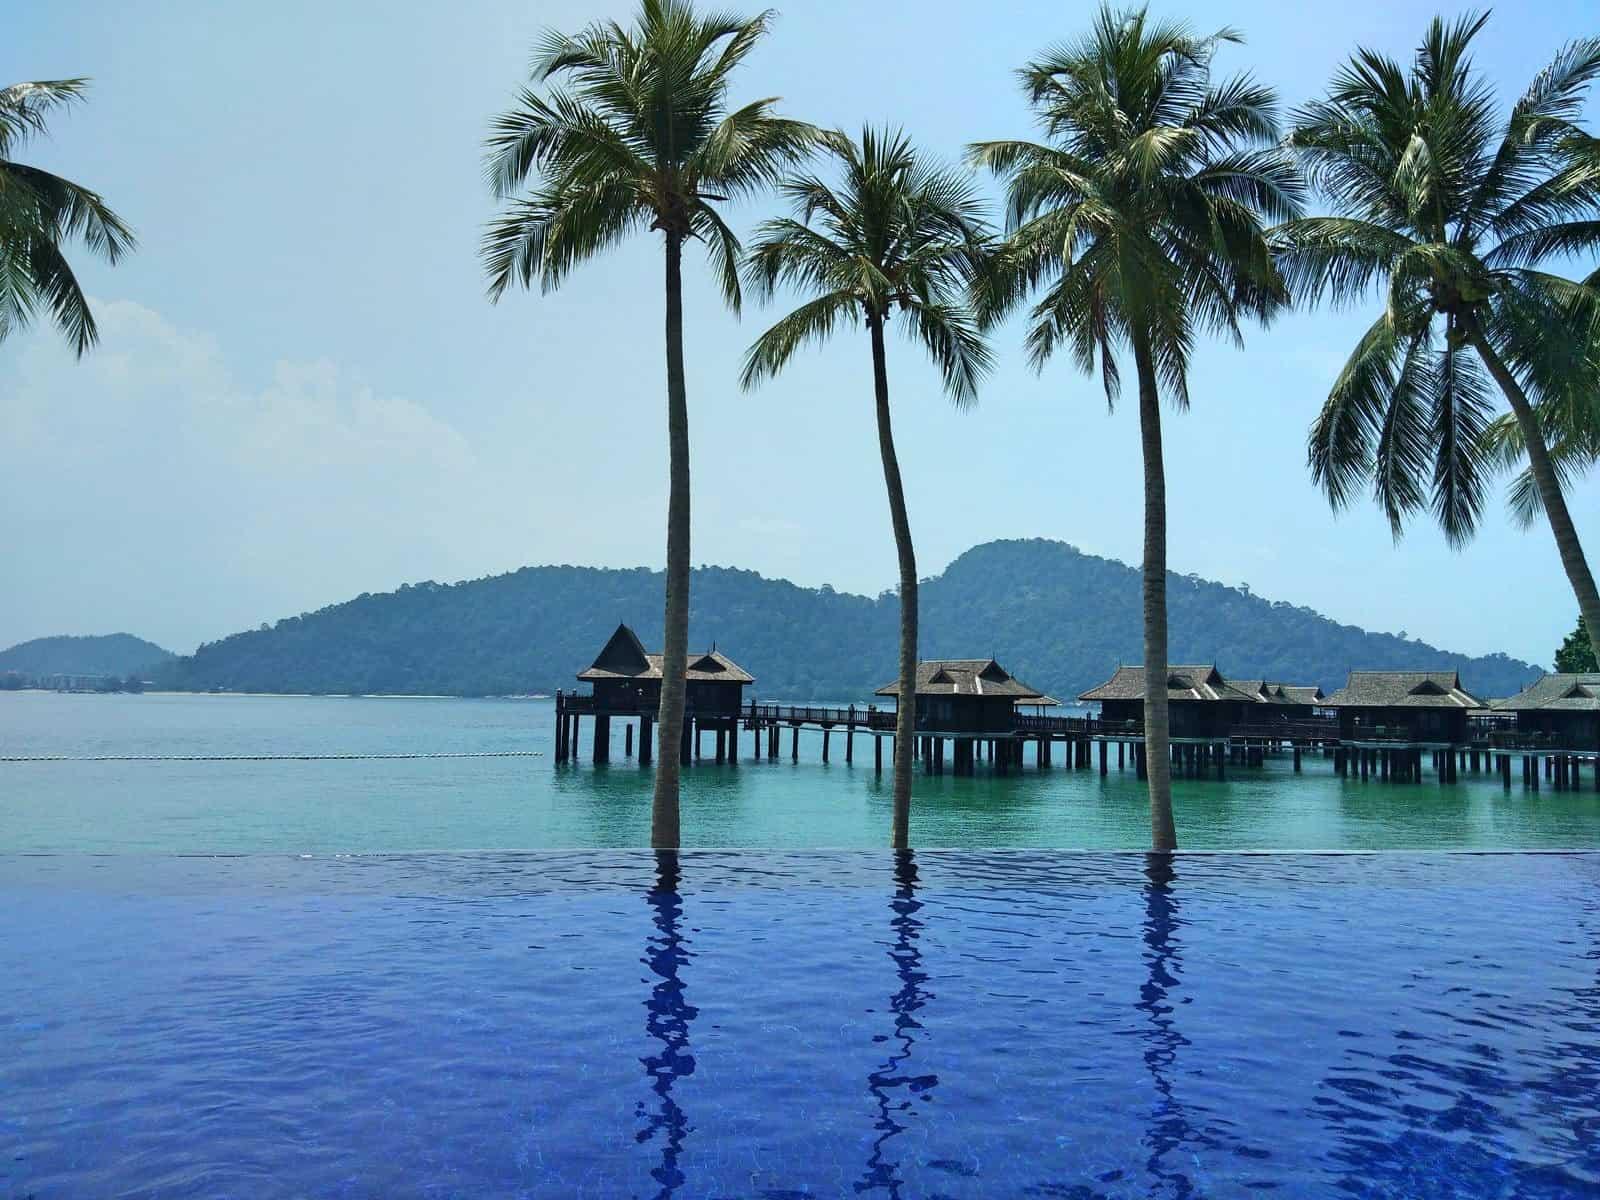 Pangkor-Laut-Resort-private-island-Malaysia-Travel-Mermaid